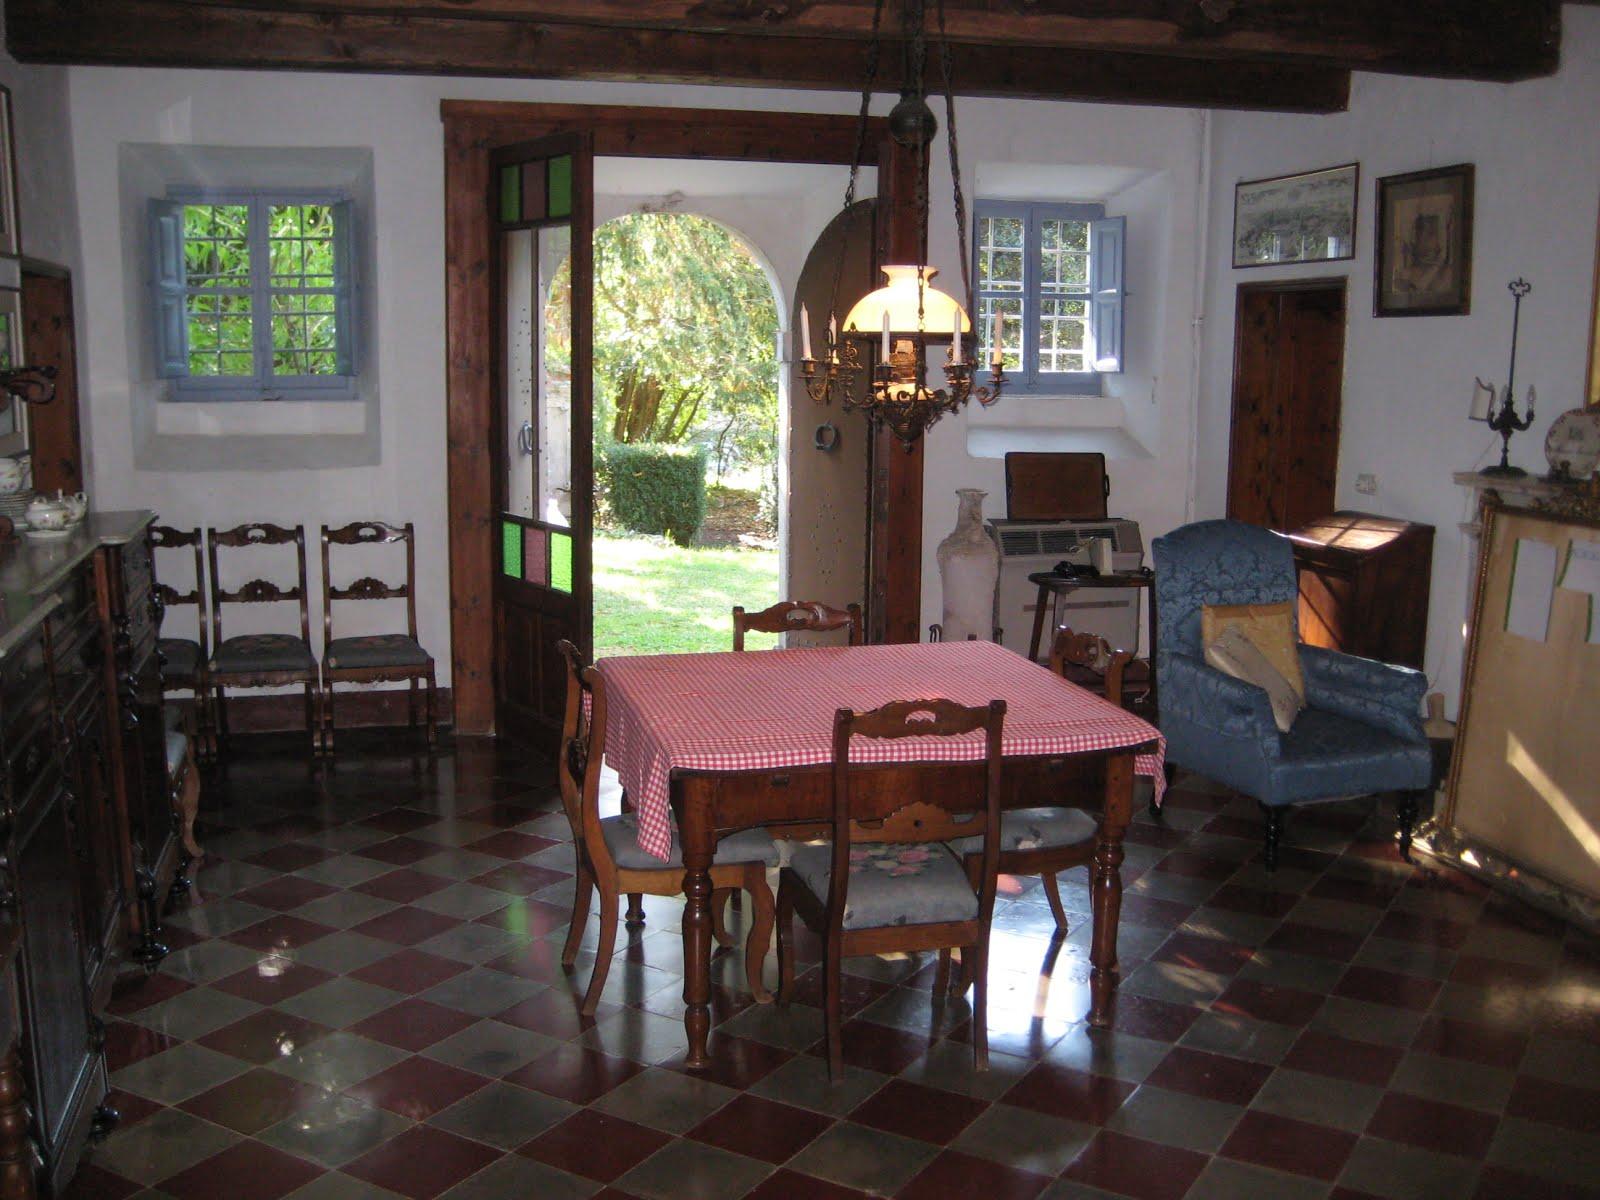 Binnenshuis